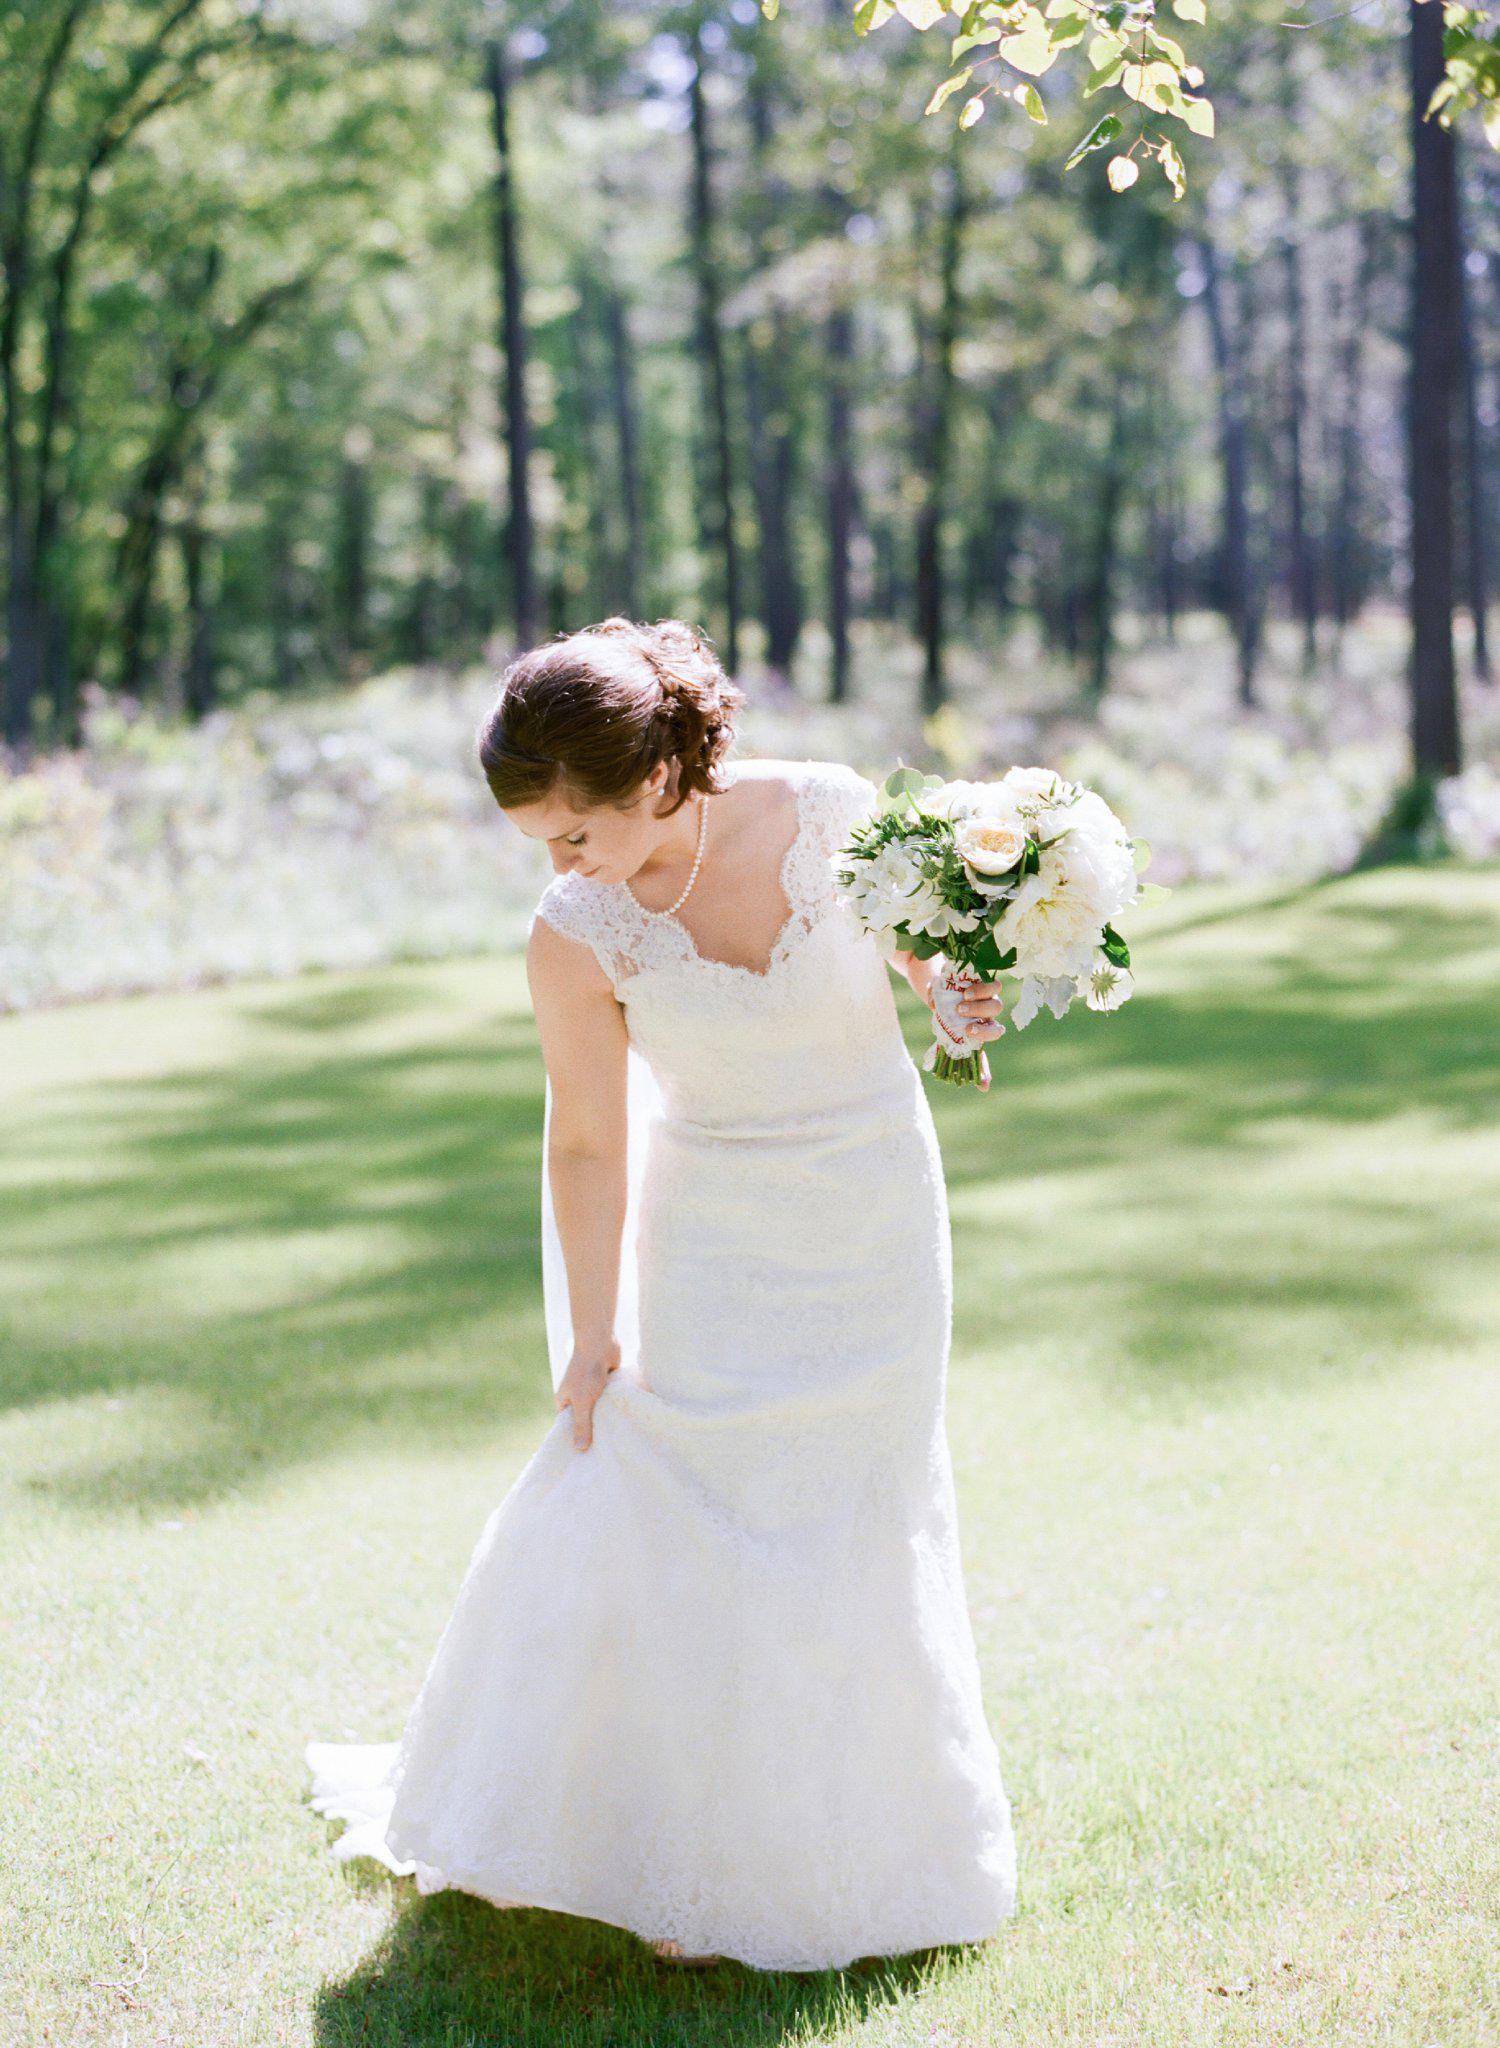 ecila farm wedding albany georgia wedding photographer shannon griffin photography-39.jpg